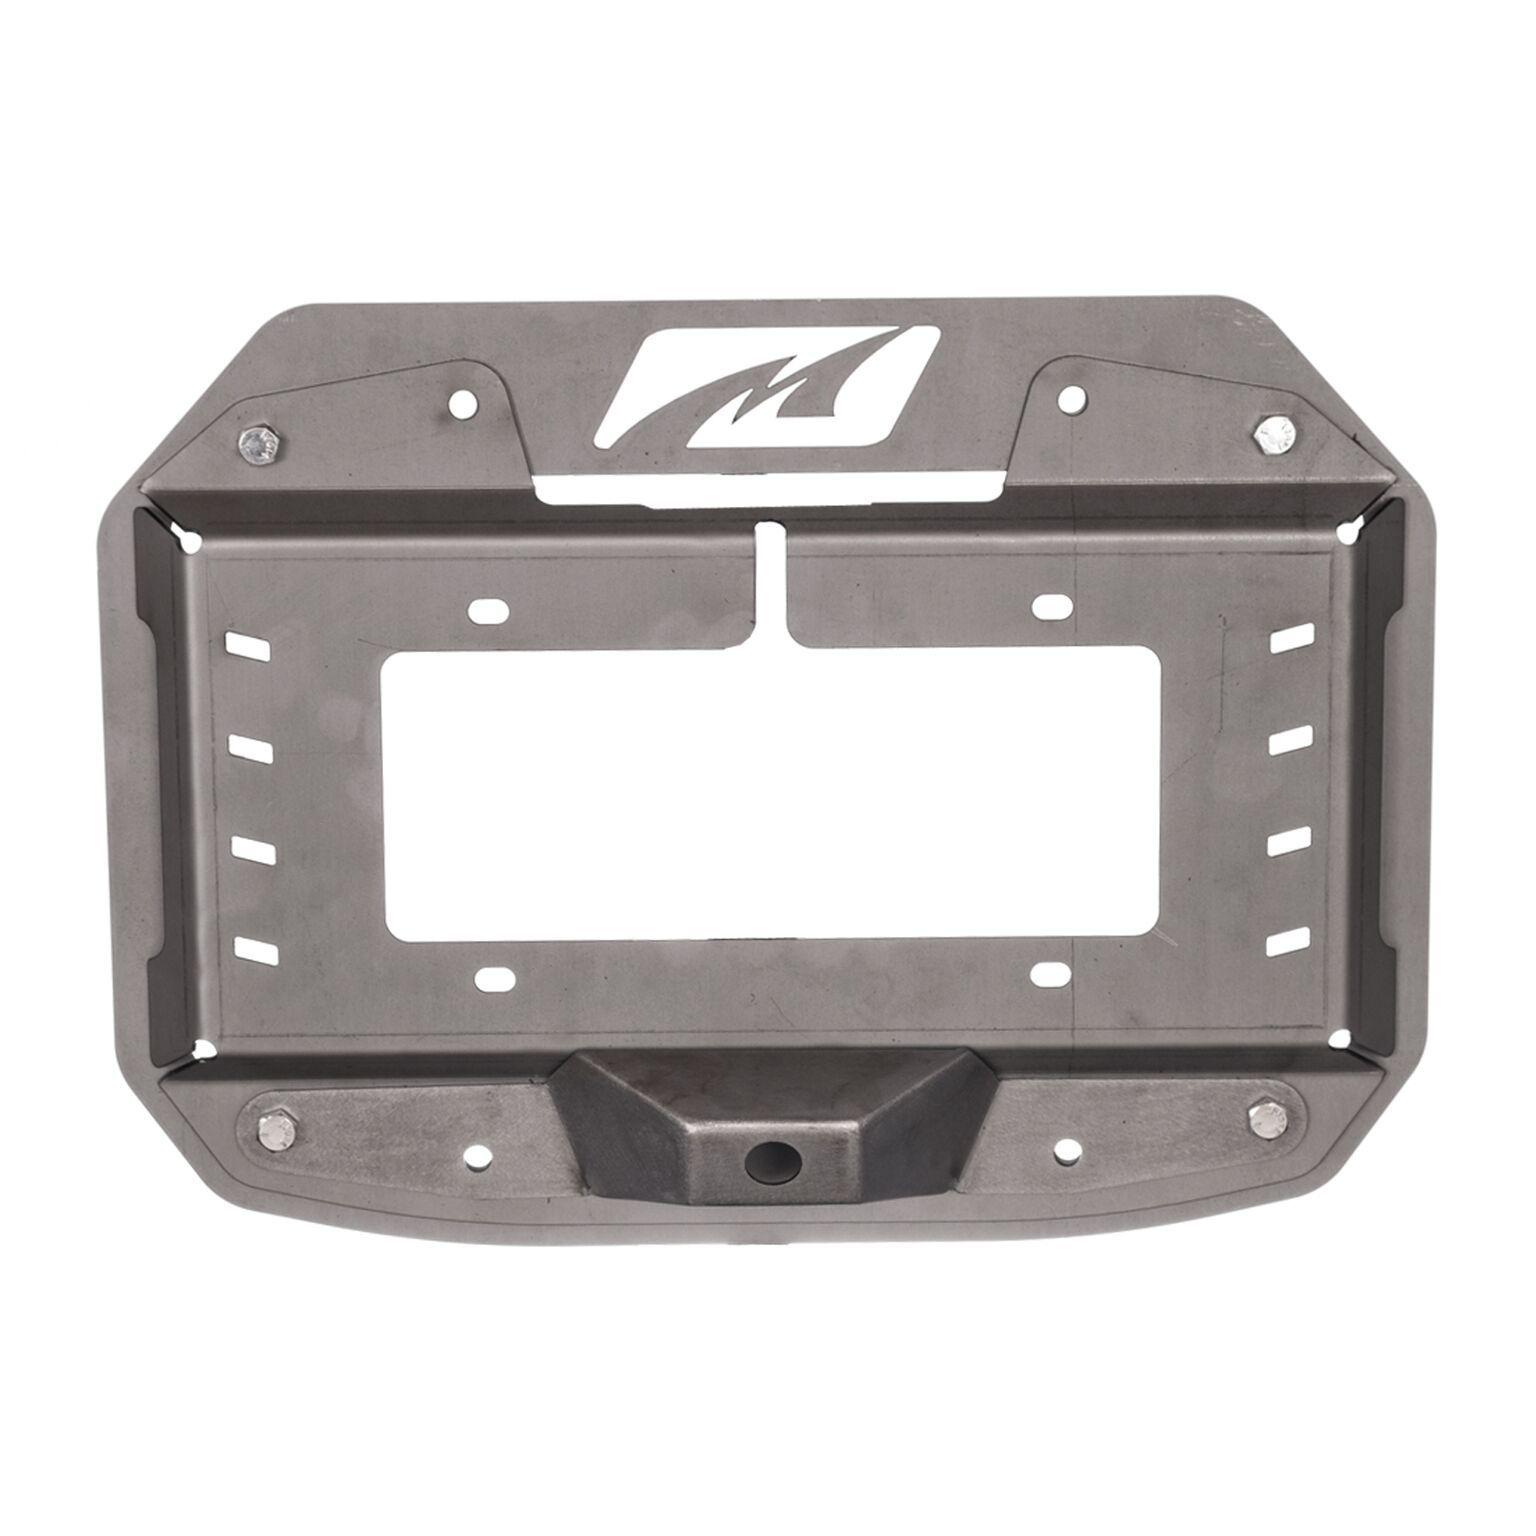 Jeep JL Spare Tire Delete Tag Mount 2018-Present Wrangler JL Motobilt